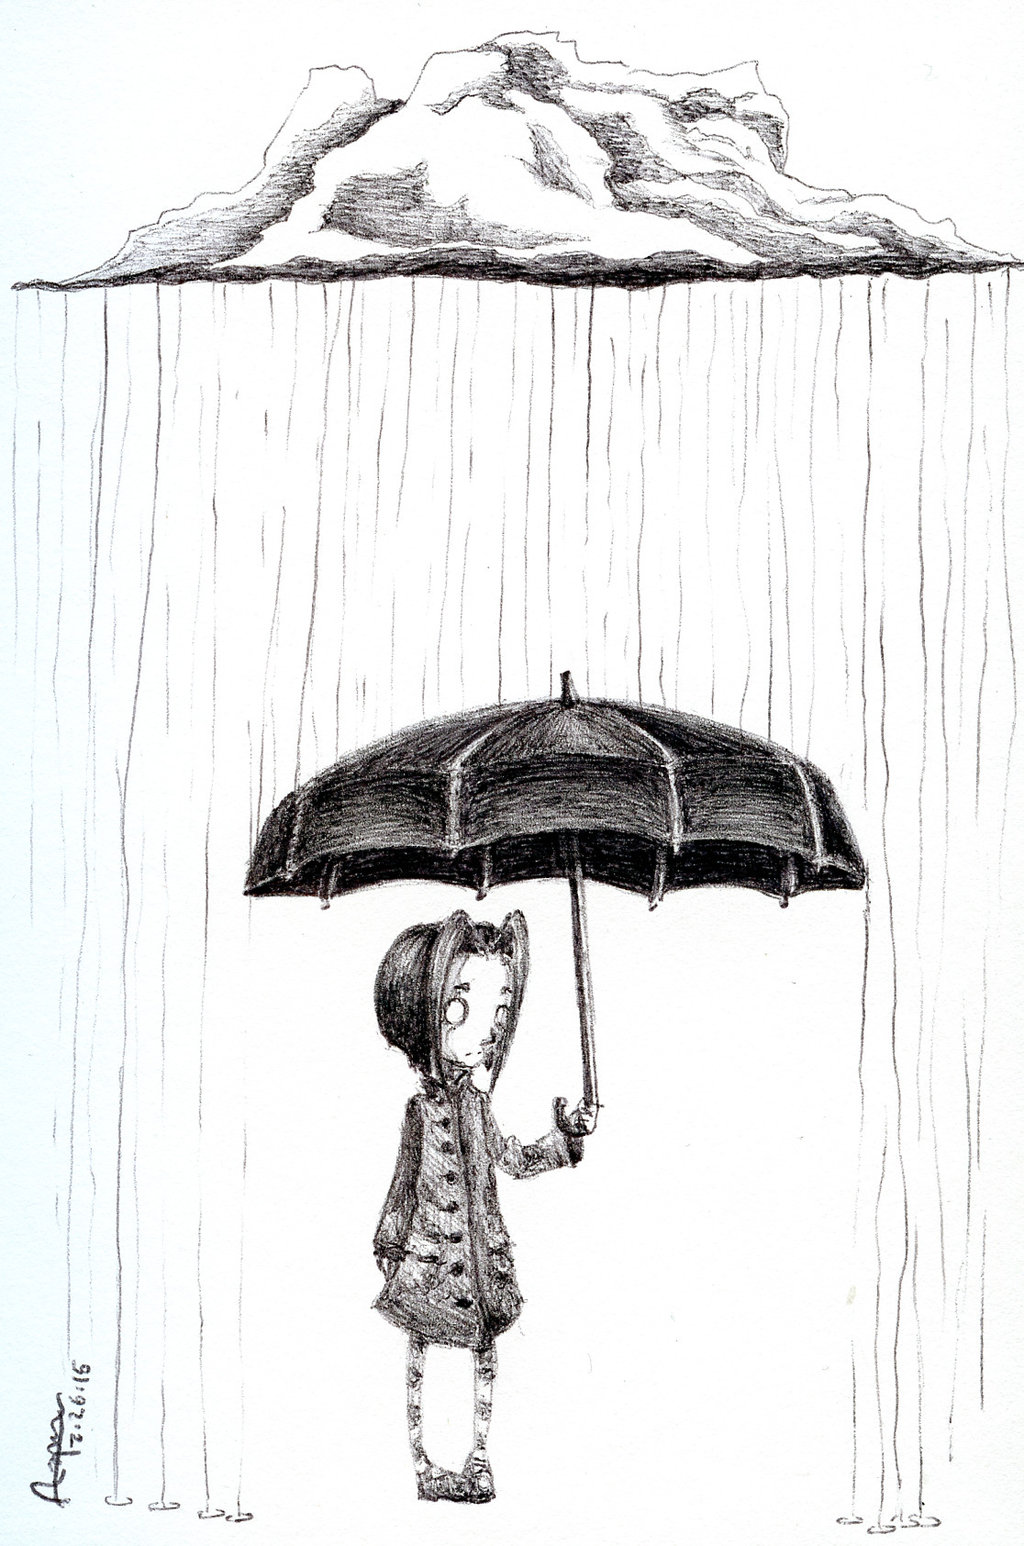 Drawn clouds rain drawing Raincloud imaprettykittykat Draw) imaprettykittykat imaprettykittykat